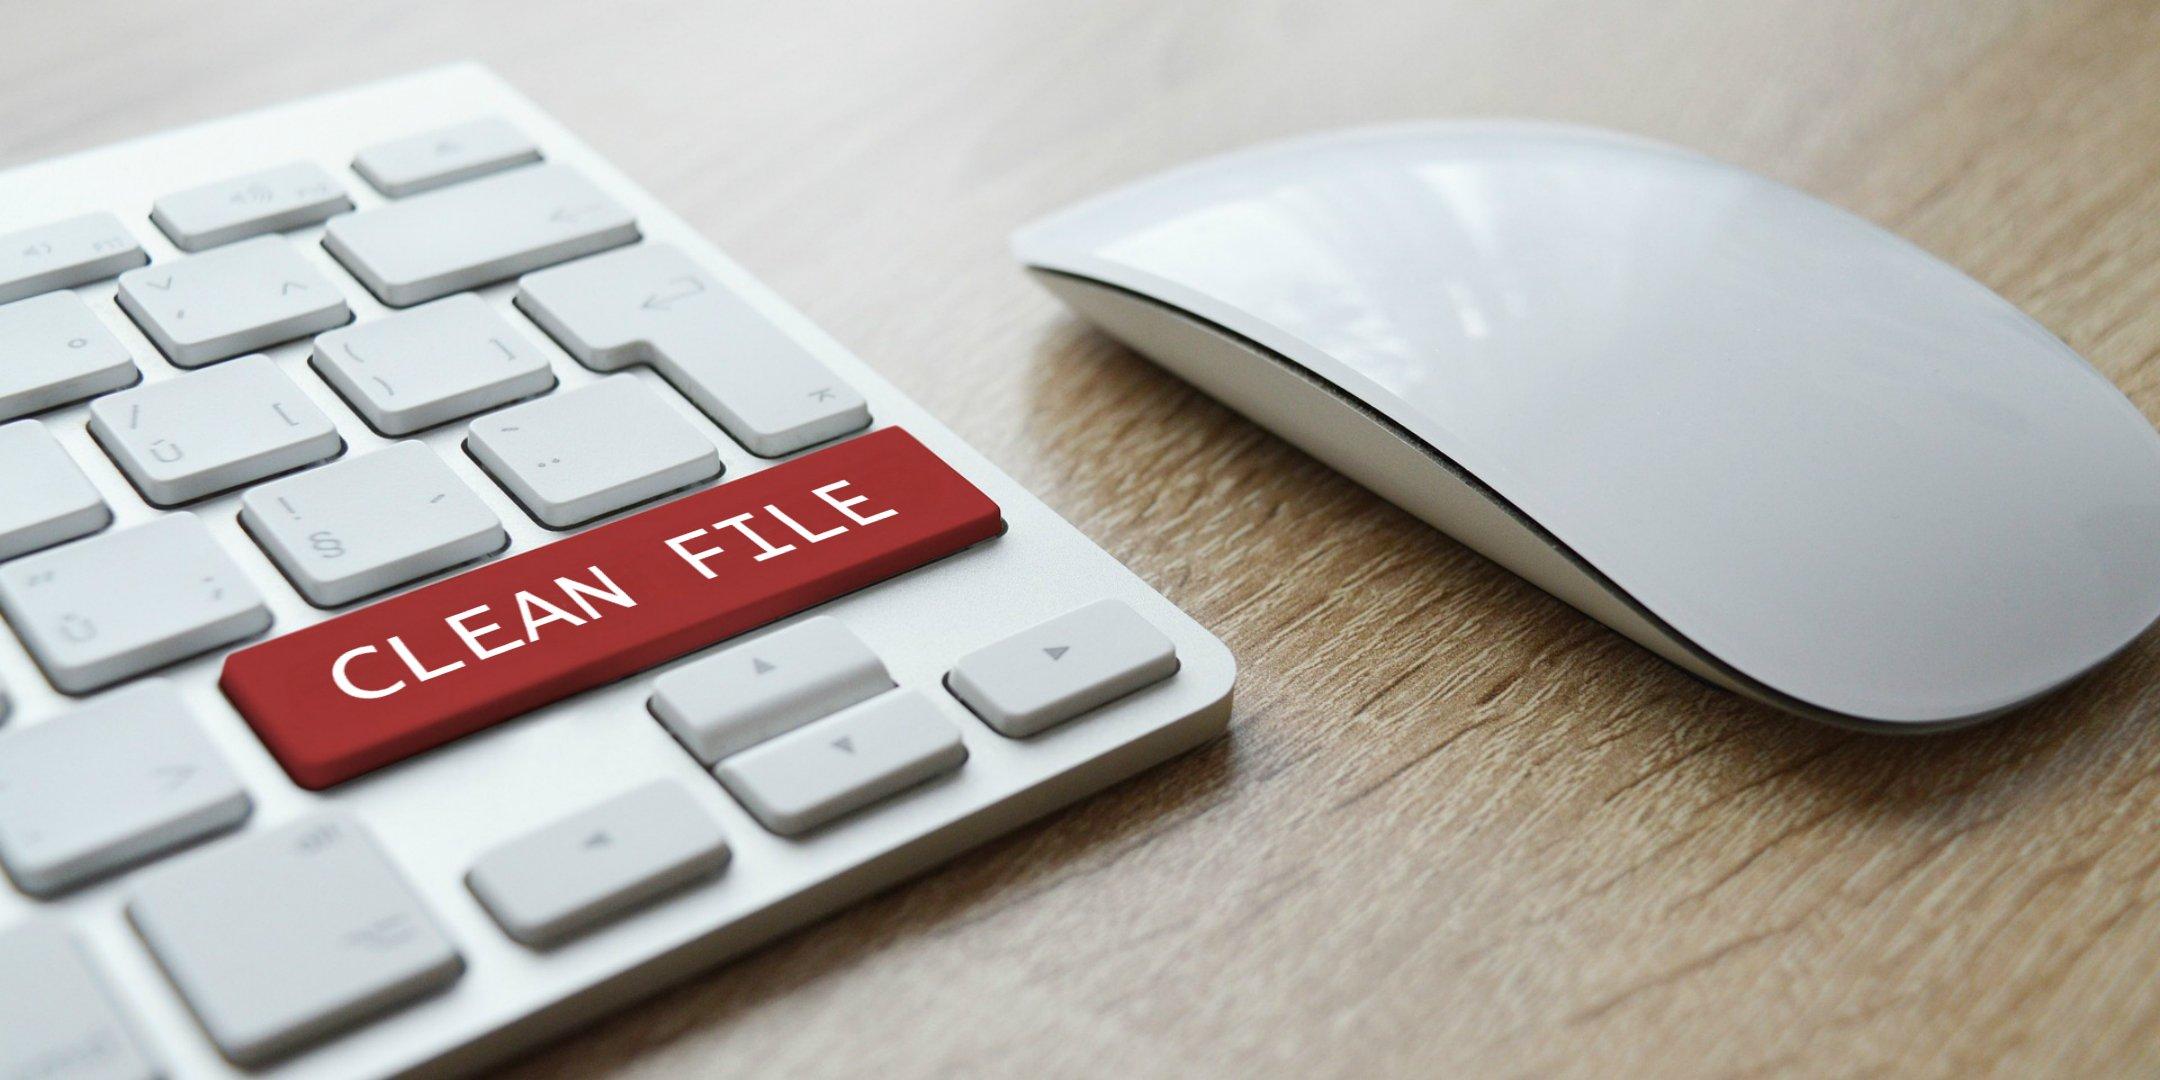 clean file